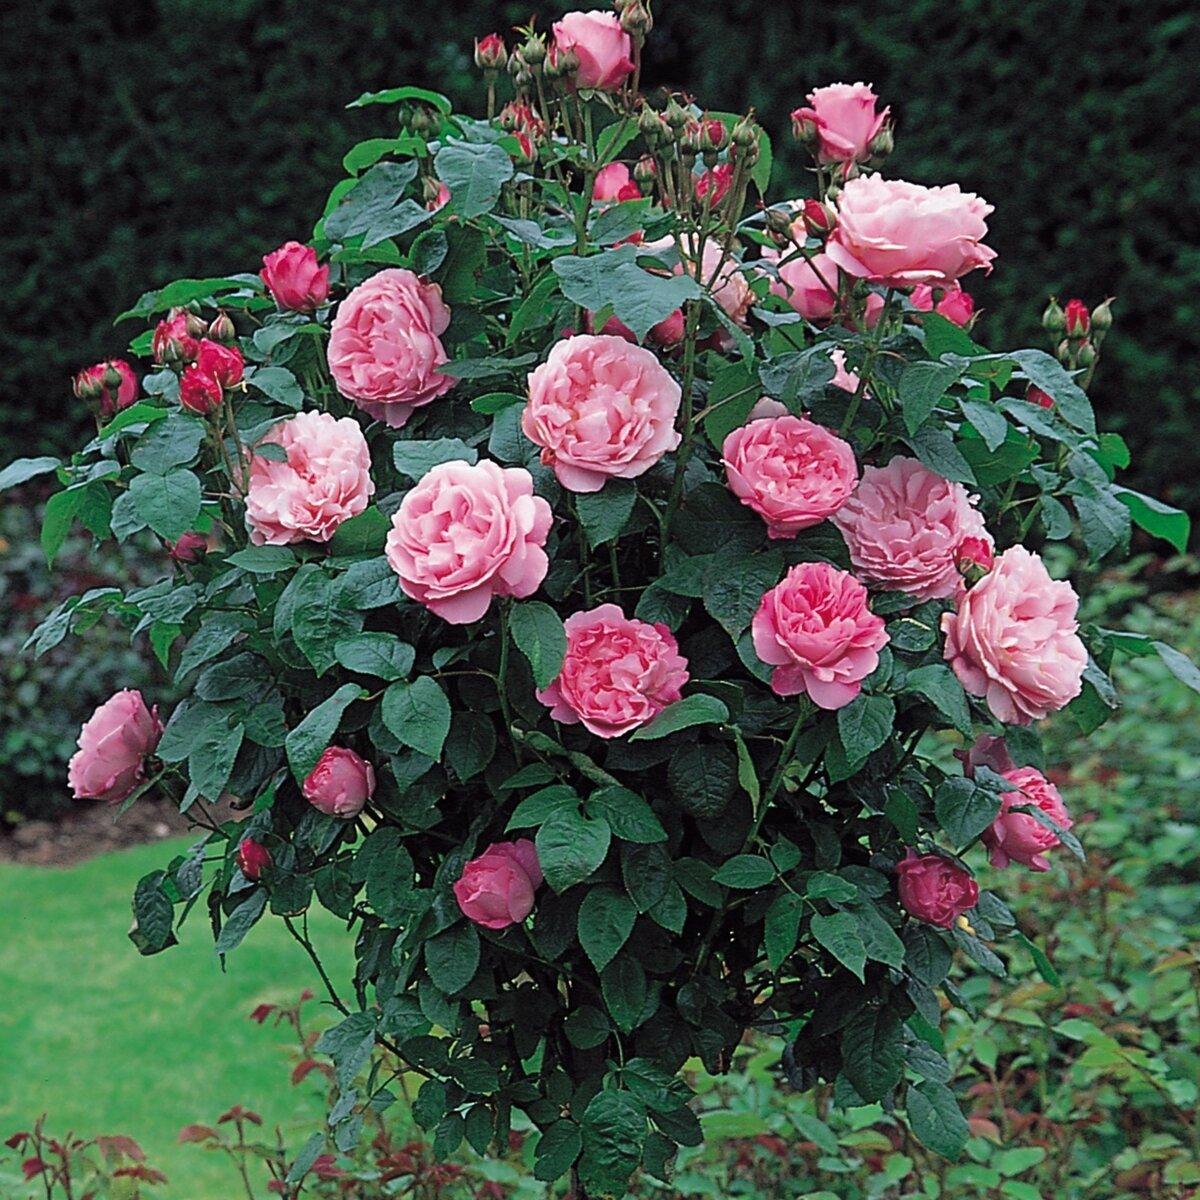 обои если роза розовое дерево фото и описание хотите